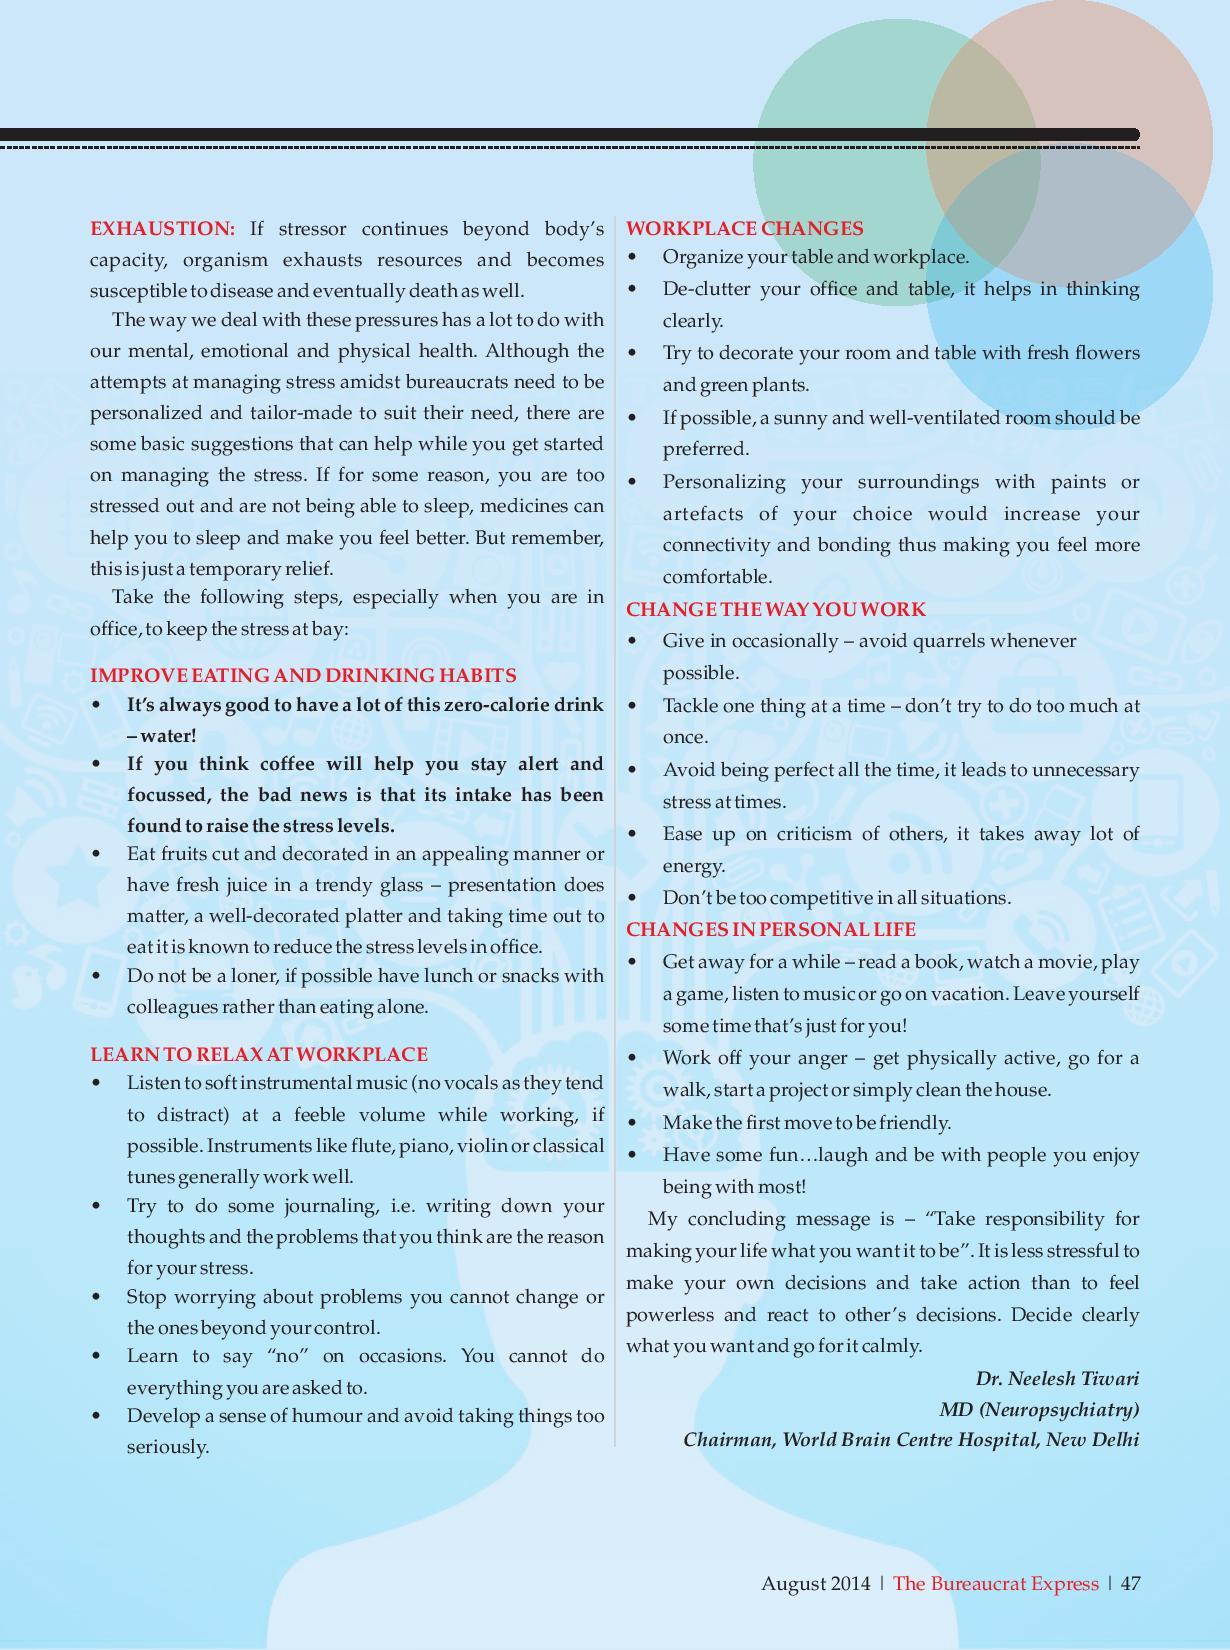 World Brain Center Dr Neelesh Tiwari.JPG464672065_August_20World Brain Center Dr Neelesh Tiwari.JPG4 (World Brain Center Dr Neelesh Tiwari.JPG)-page-002